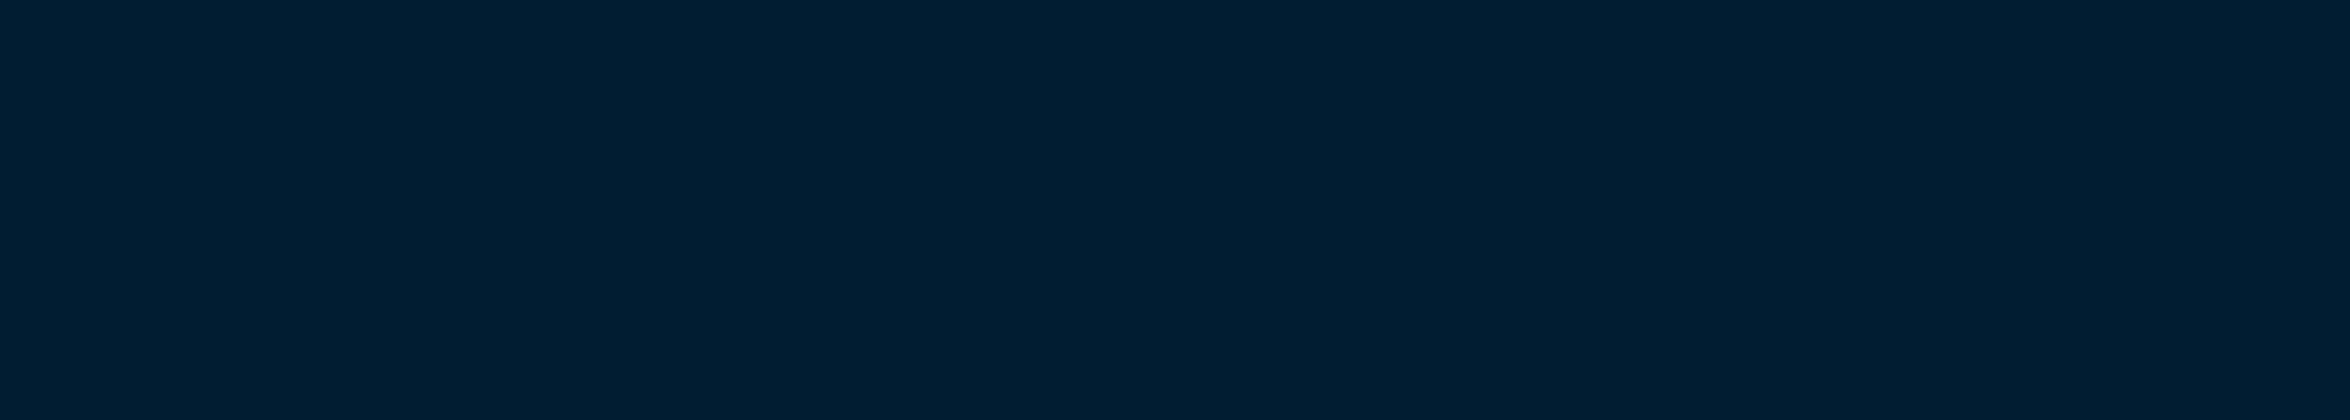 http://www.tmsrestoration.com/wp-content/uploads/2019/05/blue_gradient.png